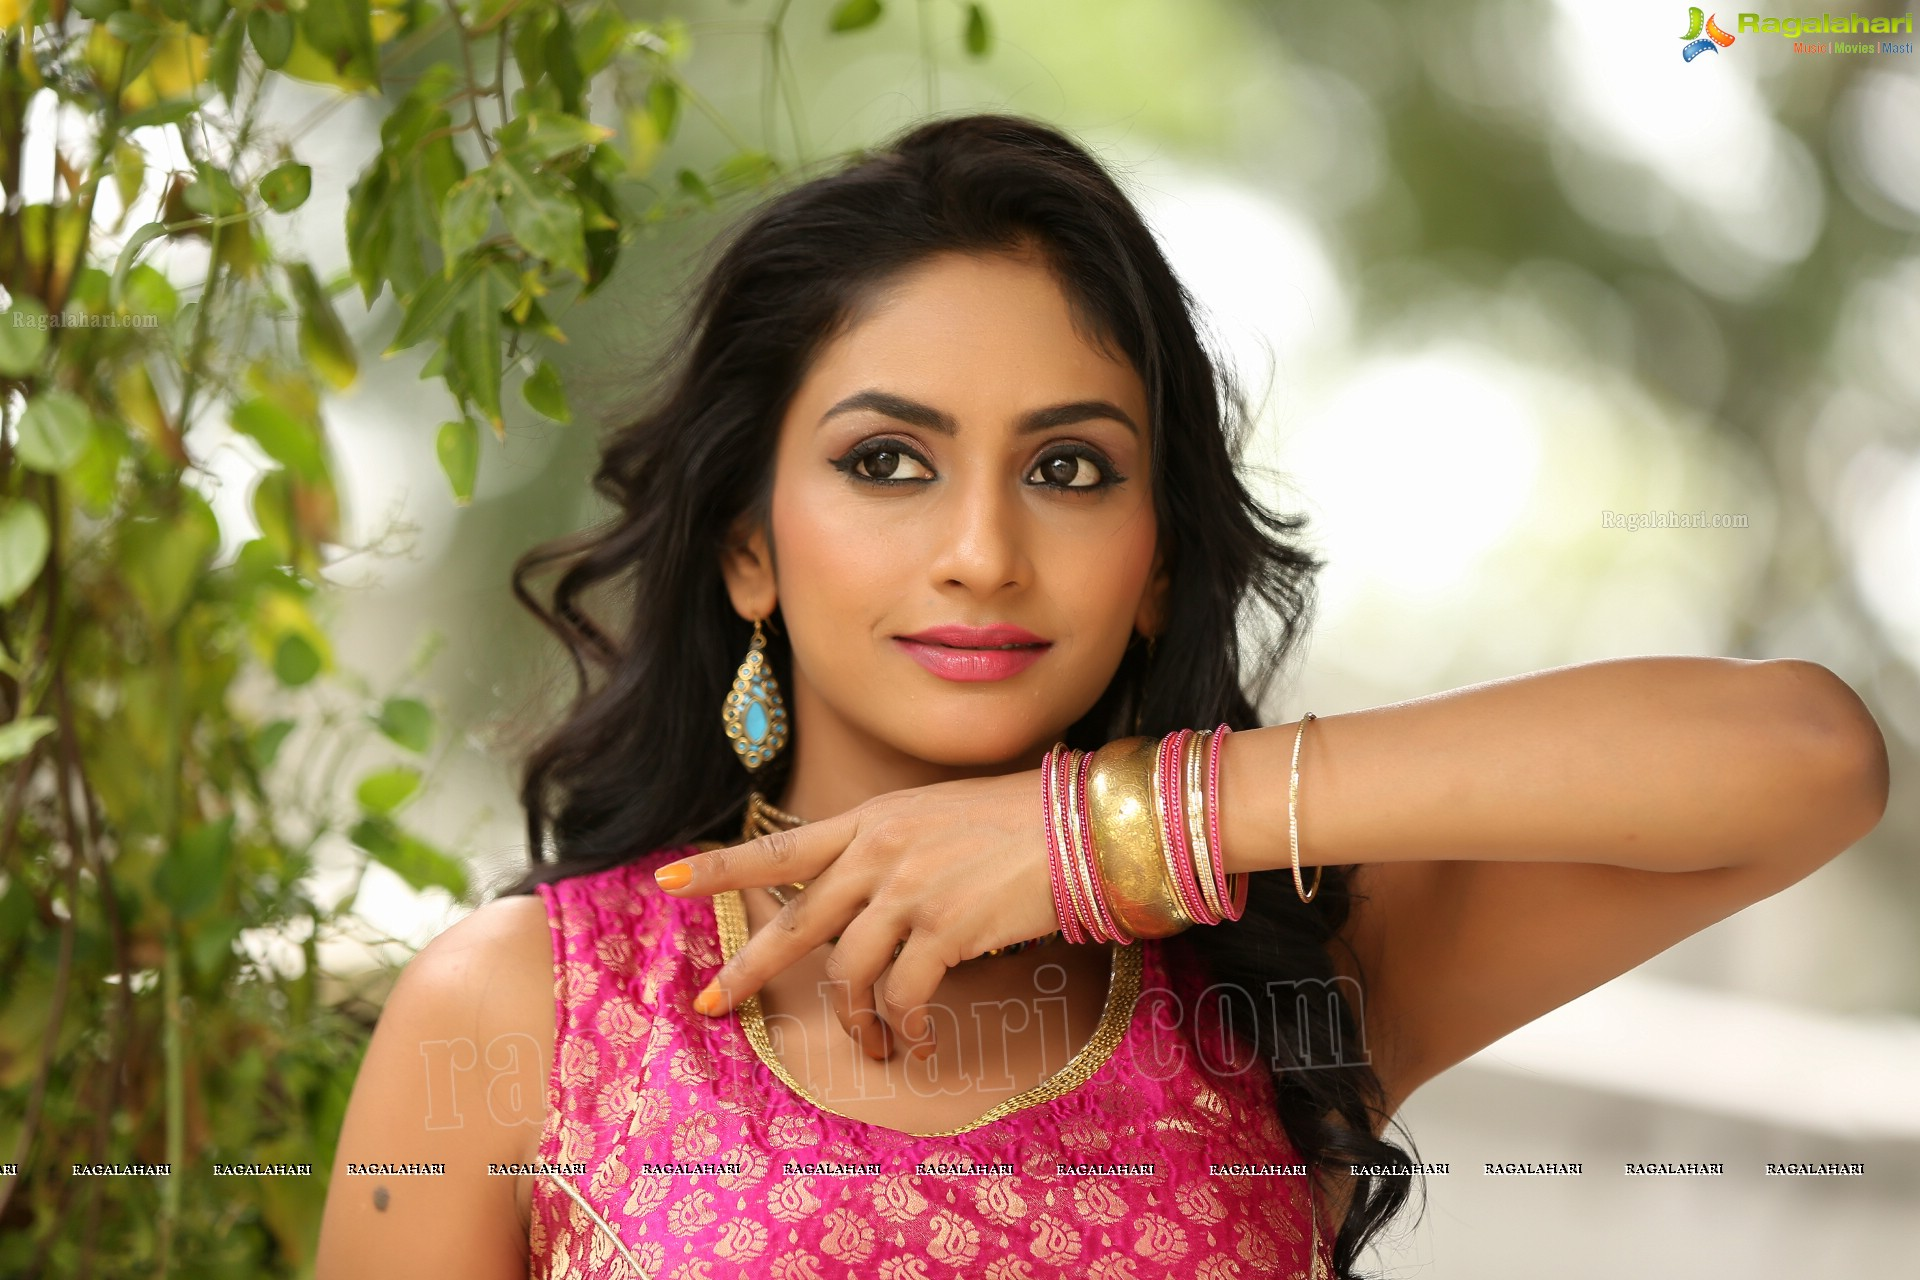 Pooja heroine hd photos